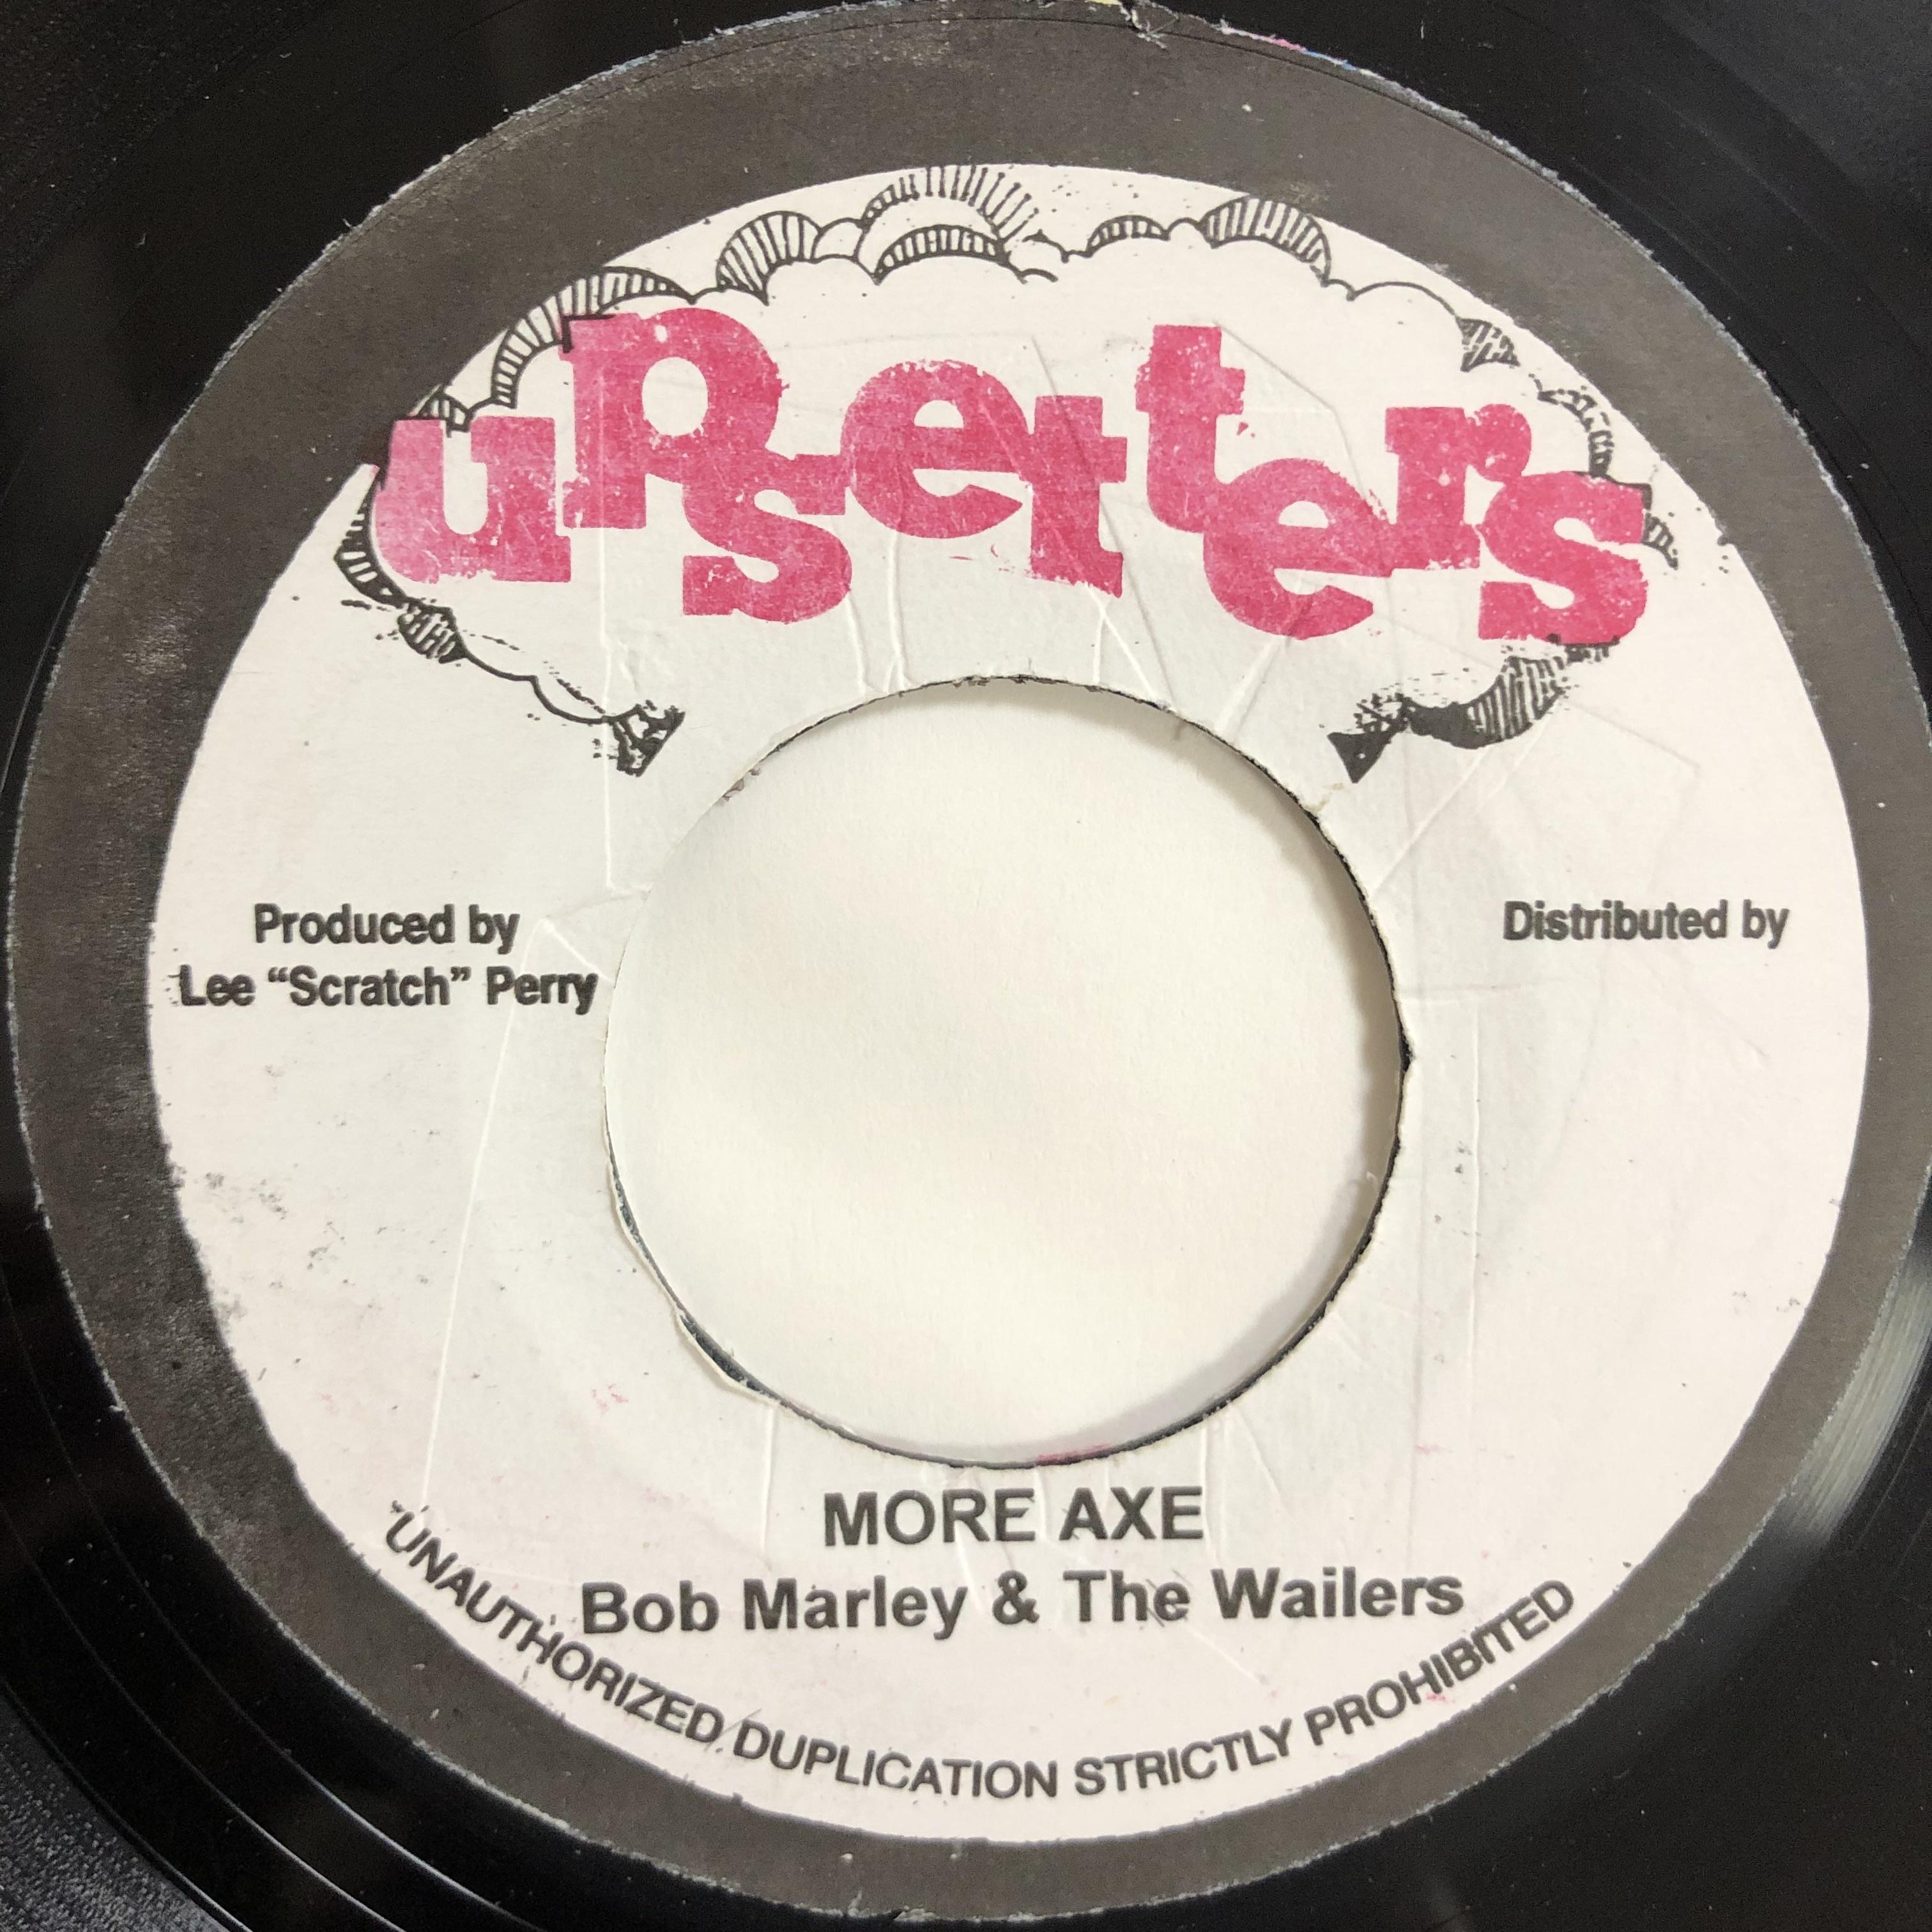 Bob Marley (ボブ・マーリー) & The Wailers (ウェイラーズ) - More Axe【7-20207】